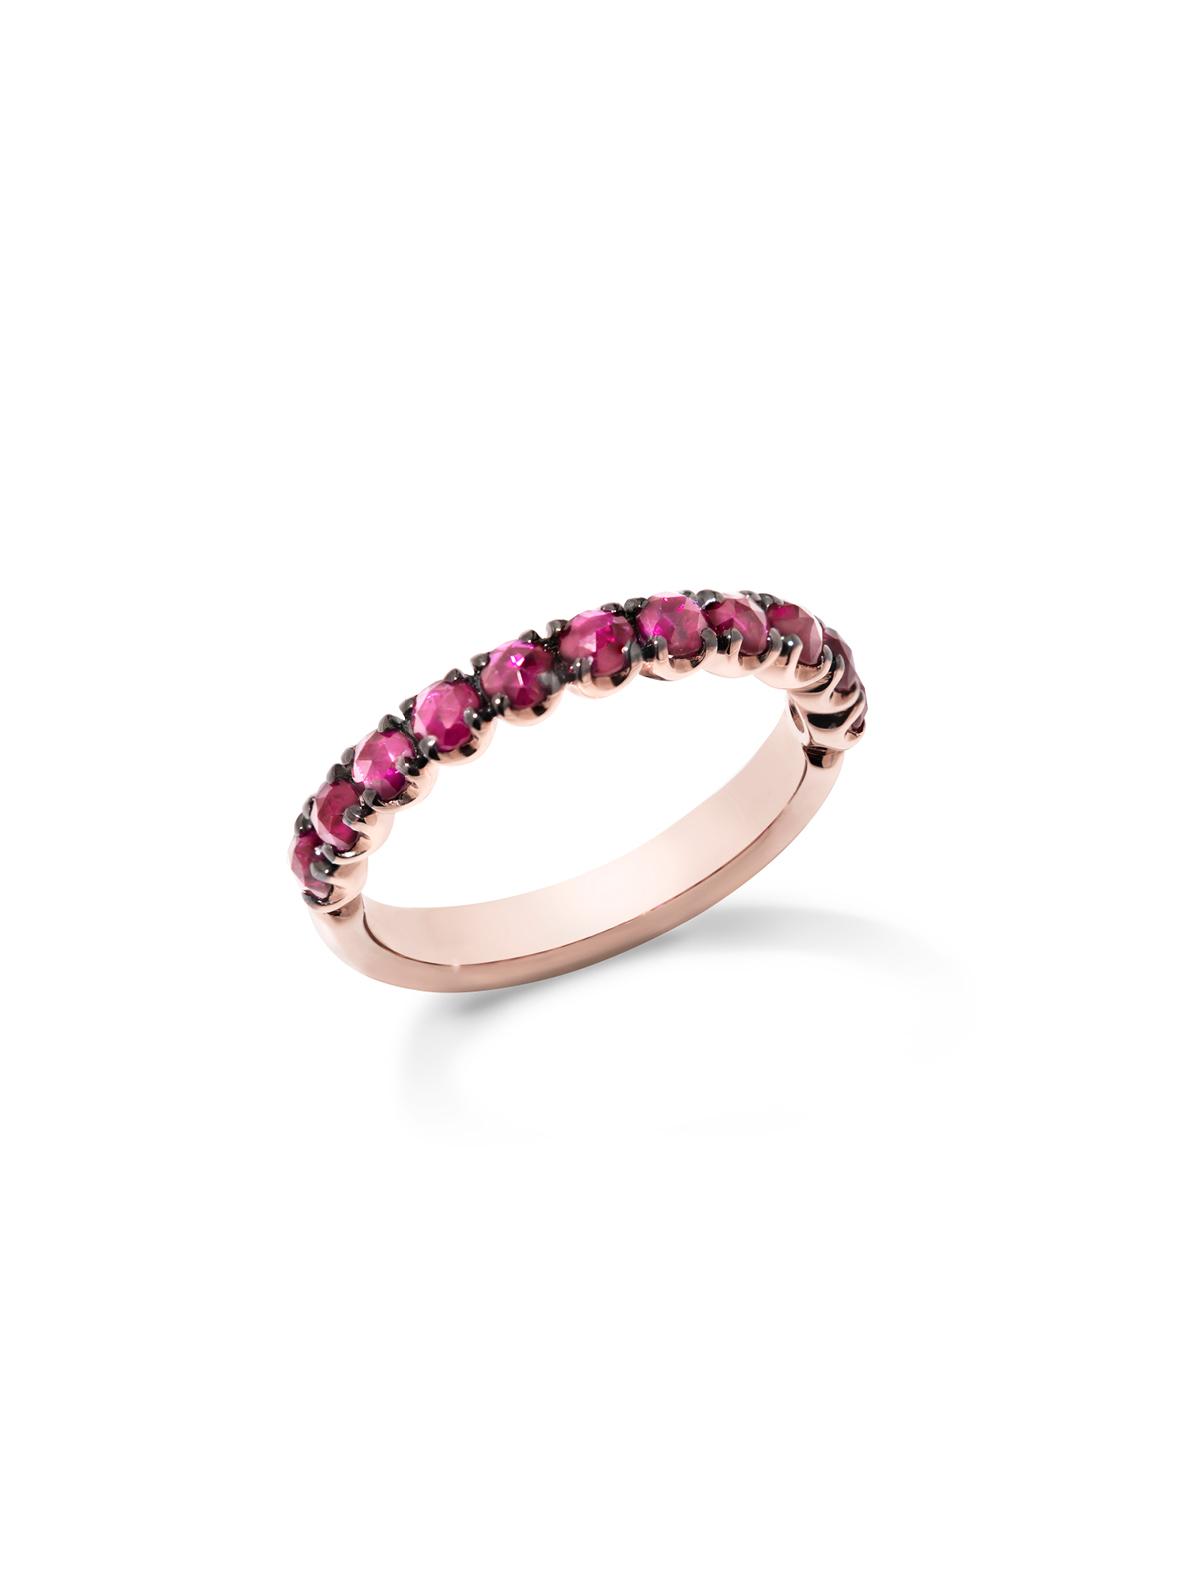 In Bloom - Ring